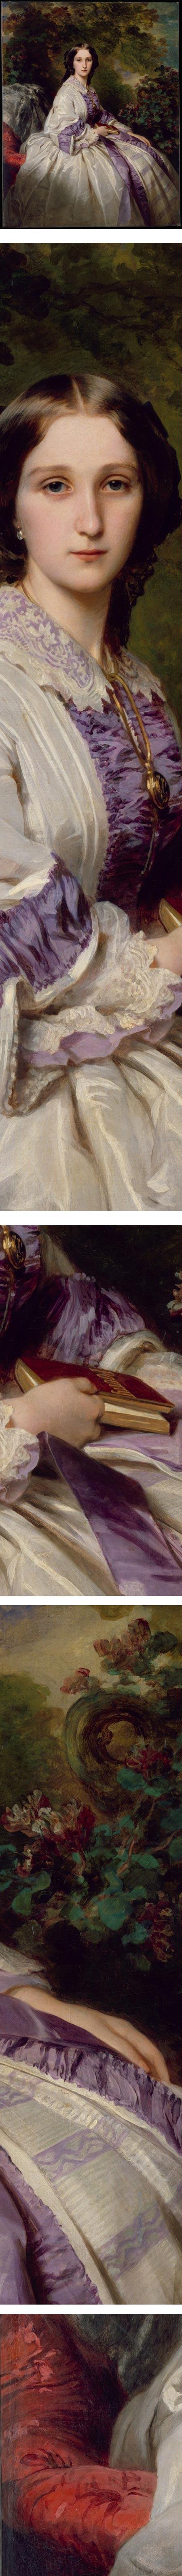 Portrait of Countess Alexander Nikolaevitch Lamsdorff (Maria Ivanovna Beck), Franz Xaver Winterhalter